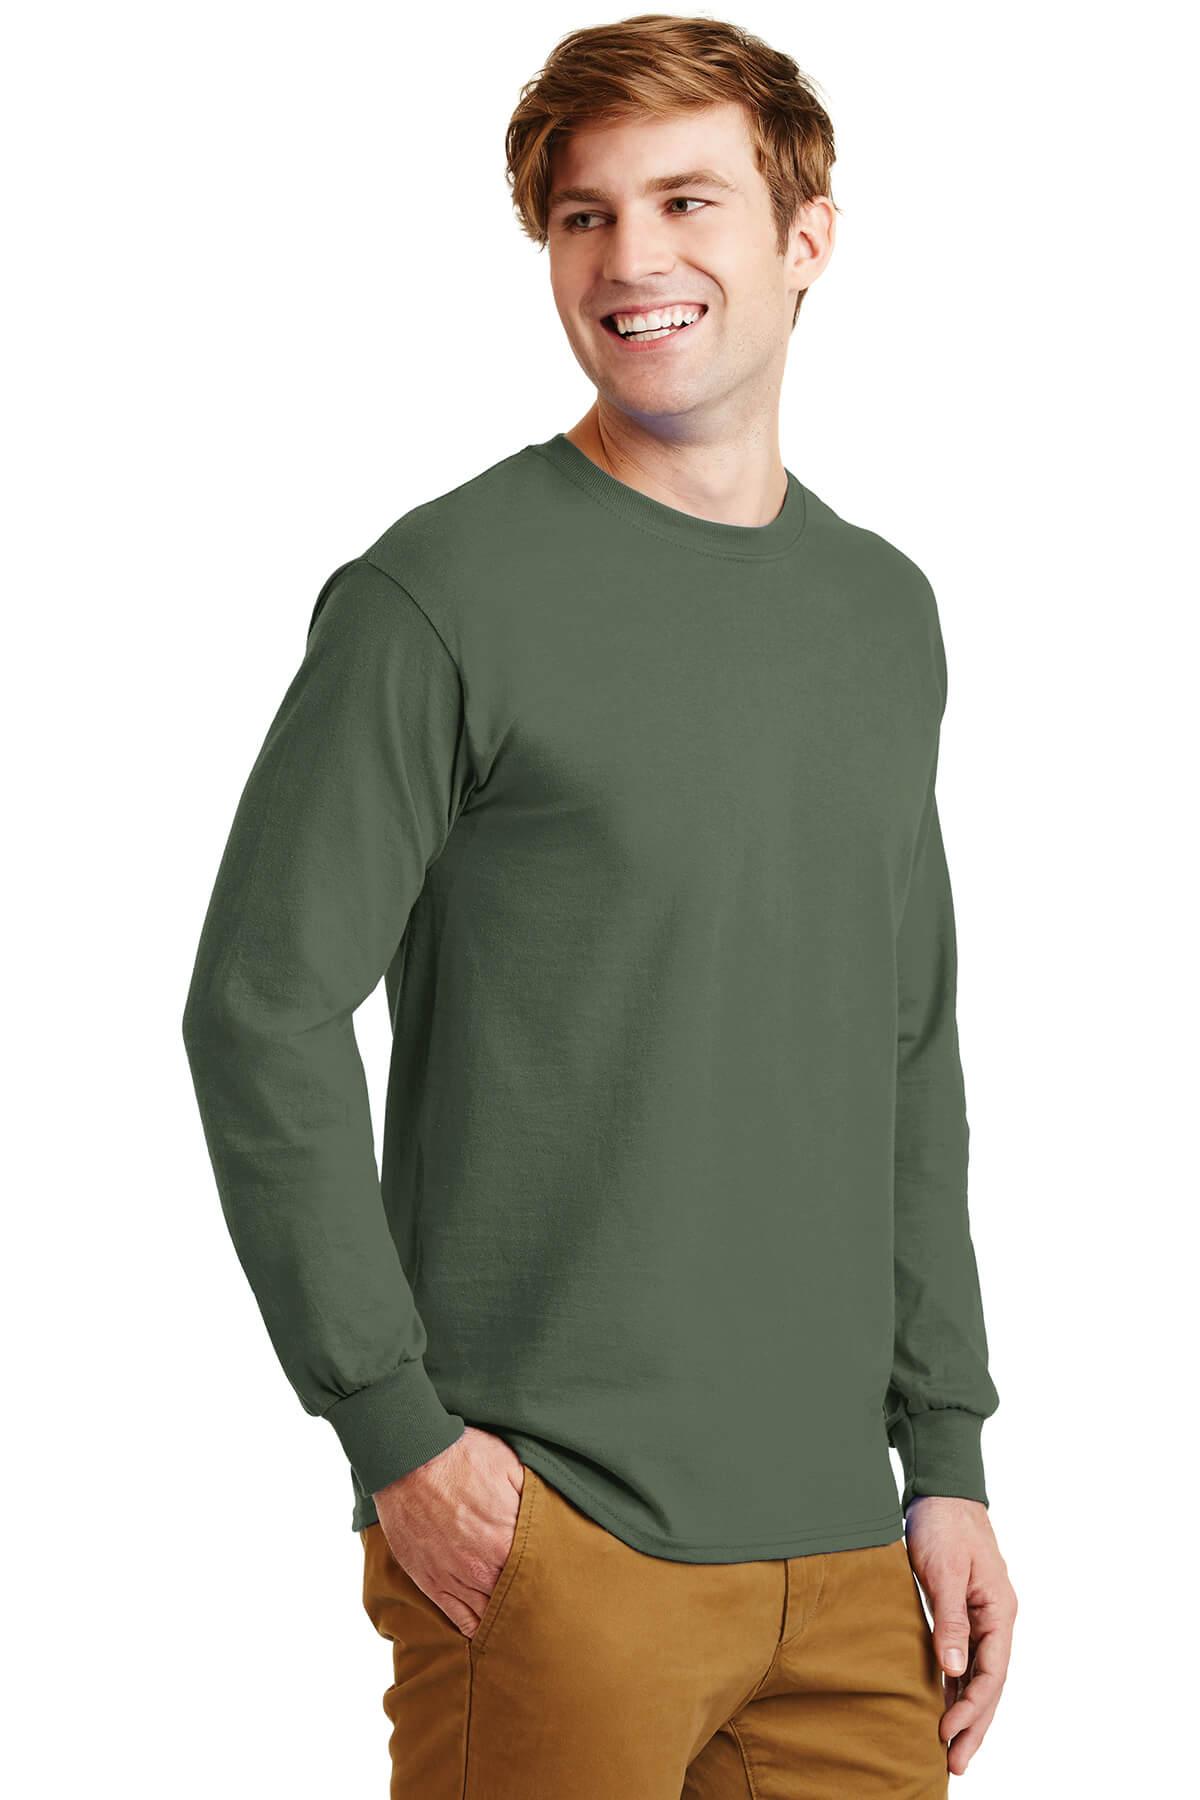 g2400-military-green-4